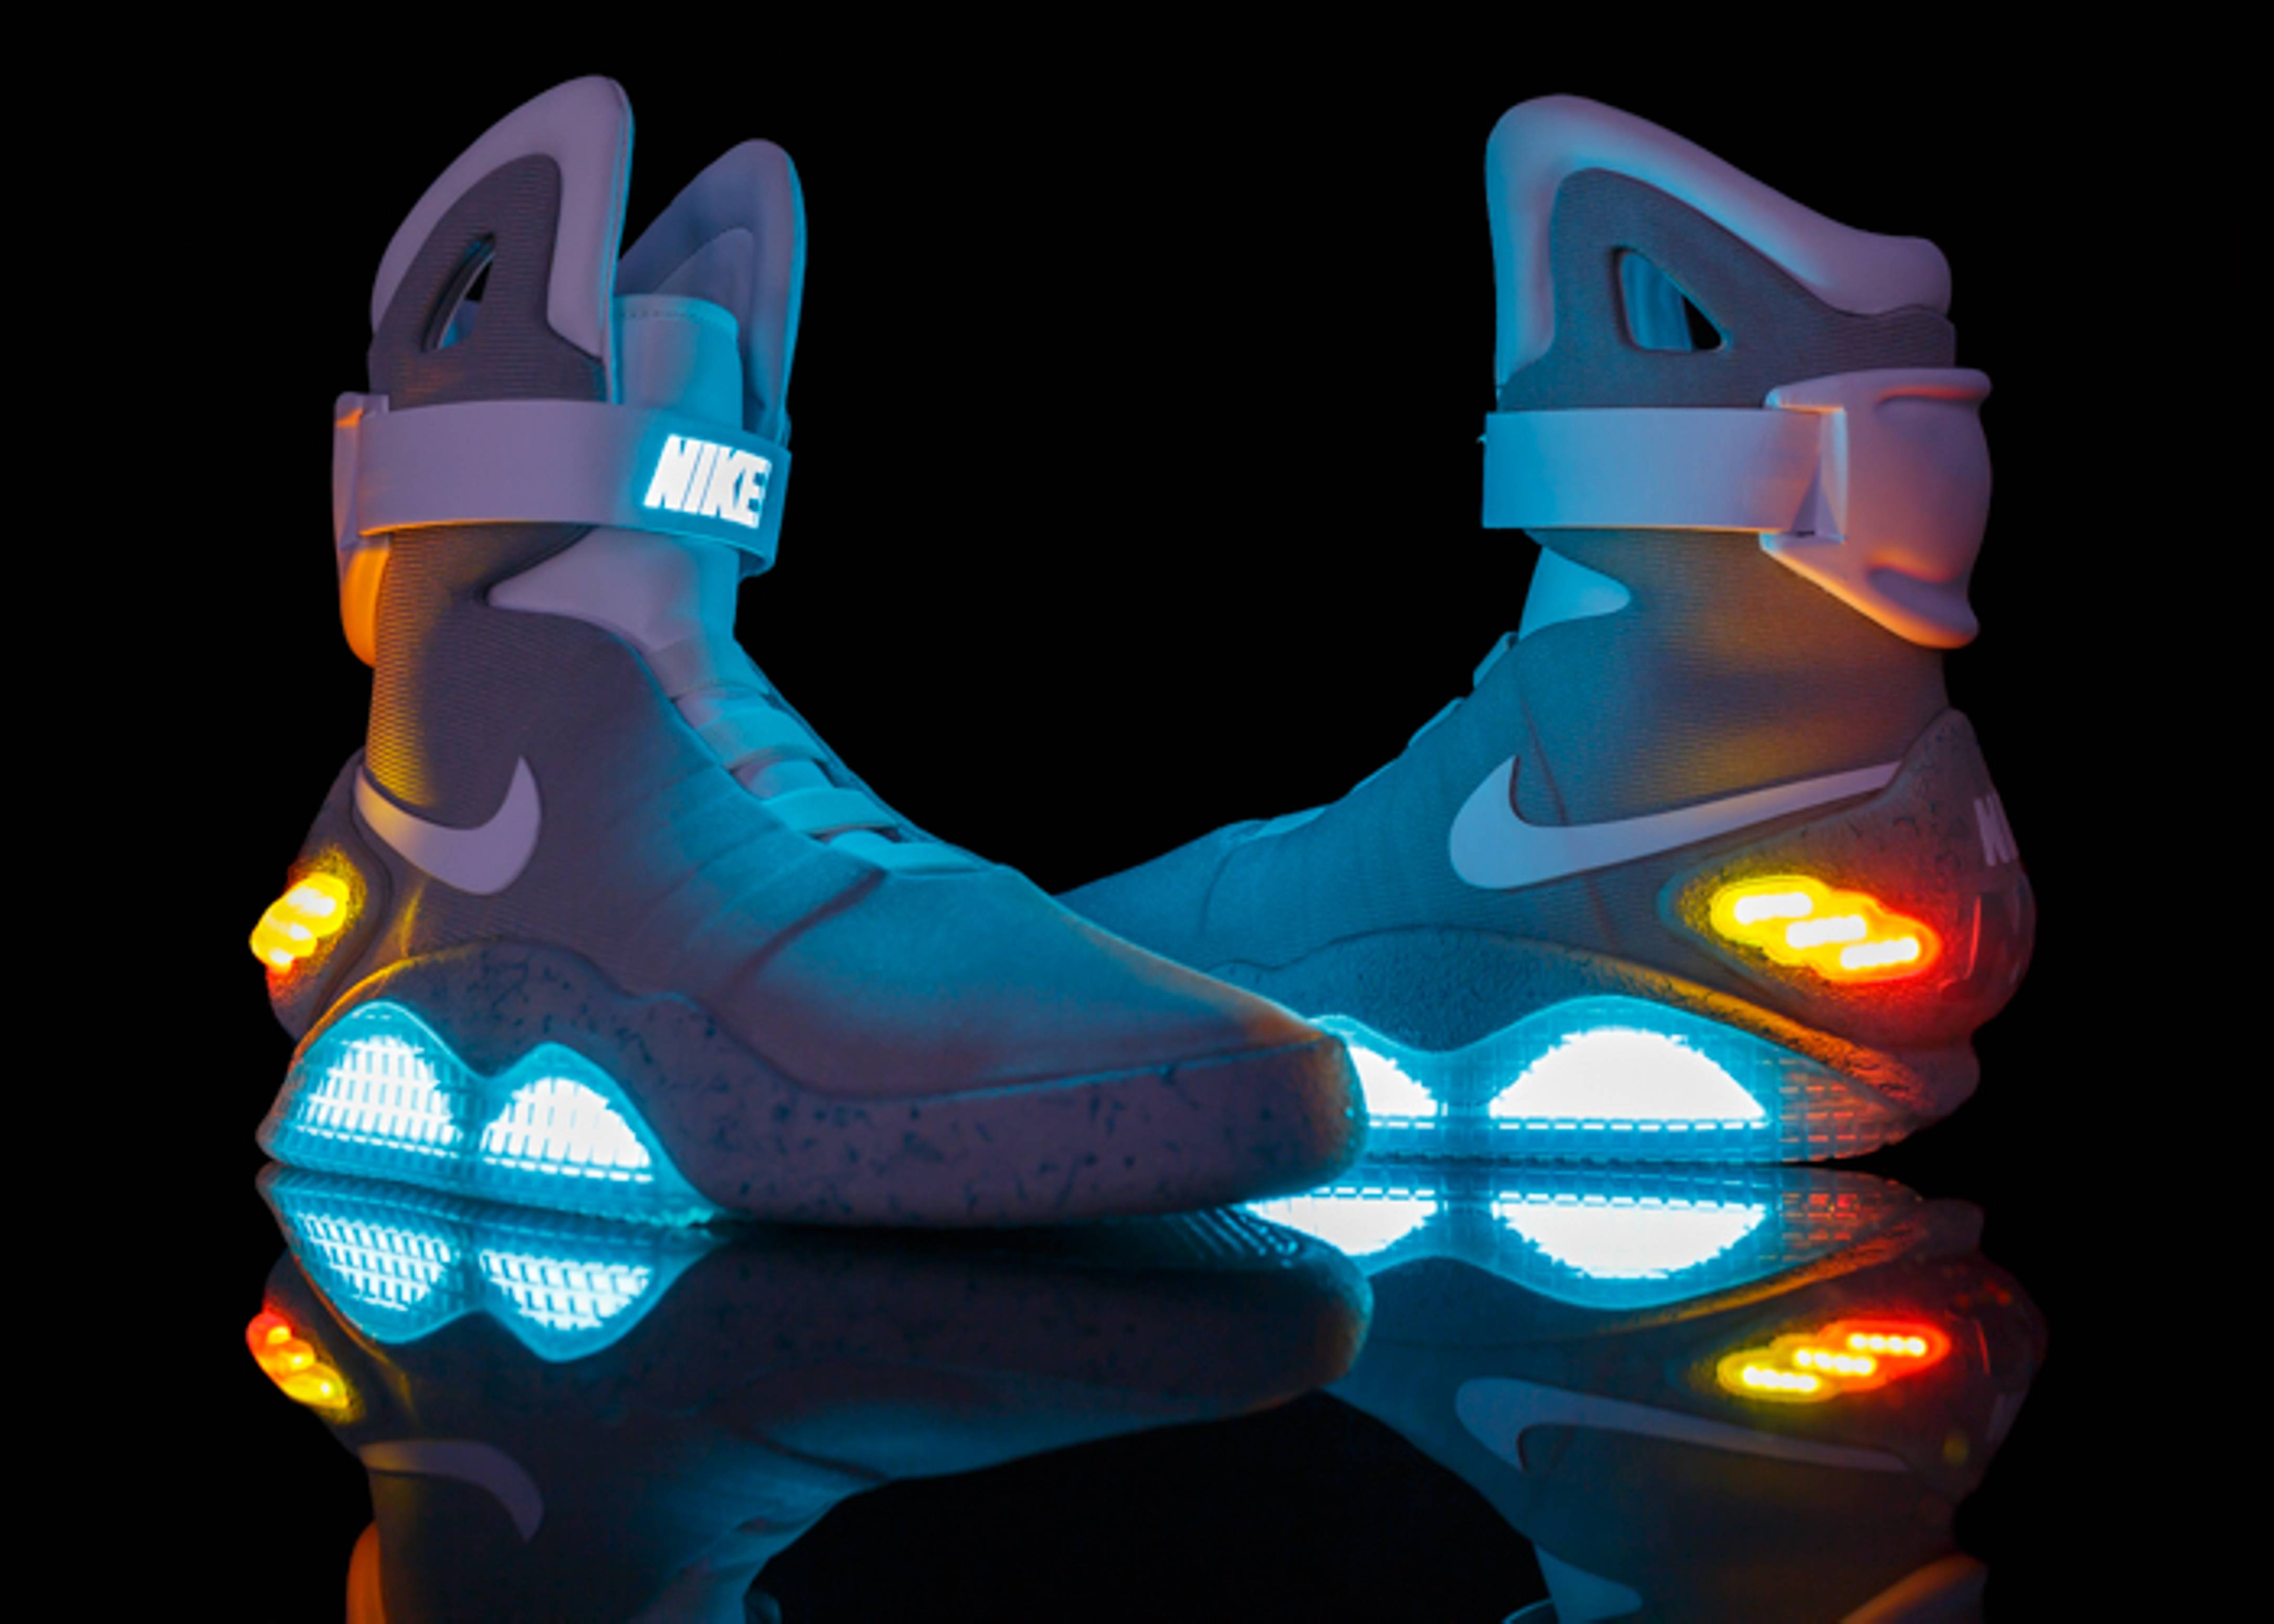 Descartar Mutilar Paloma  Nike Mag 'Back To The Future' - Nike - 417744 001 - jetstream/white-pl blue  | Flight Club